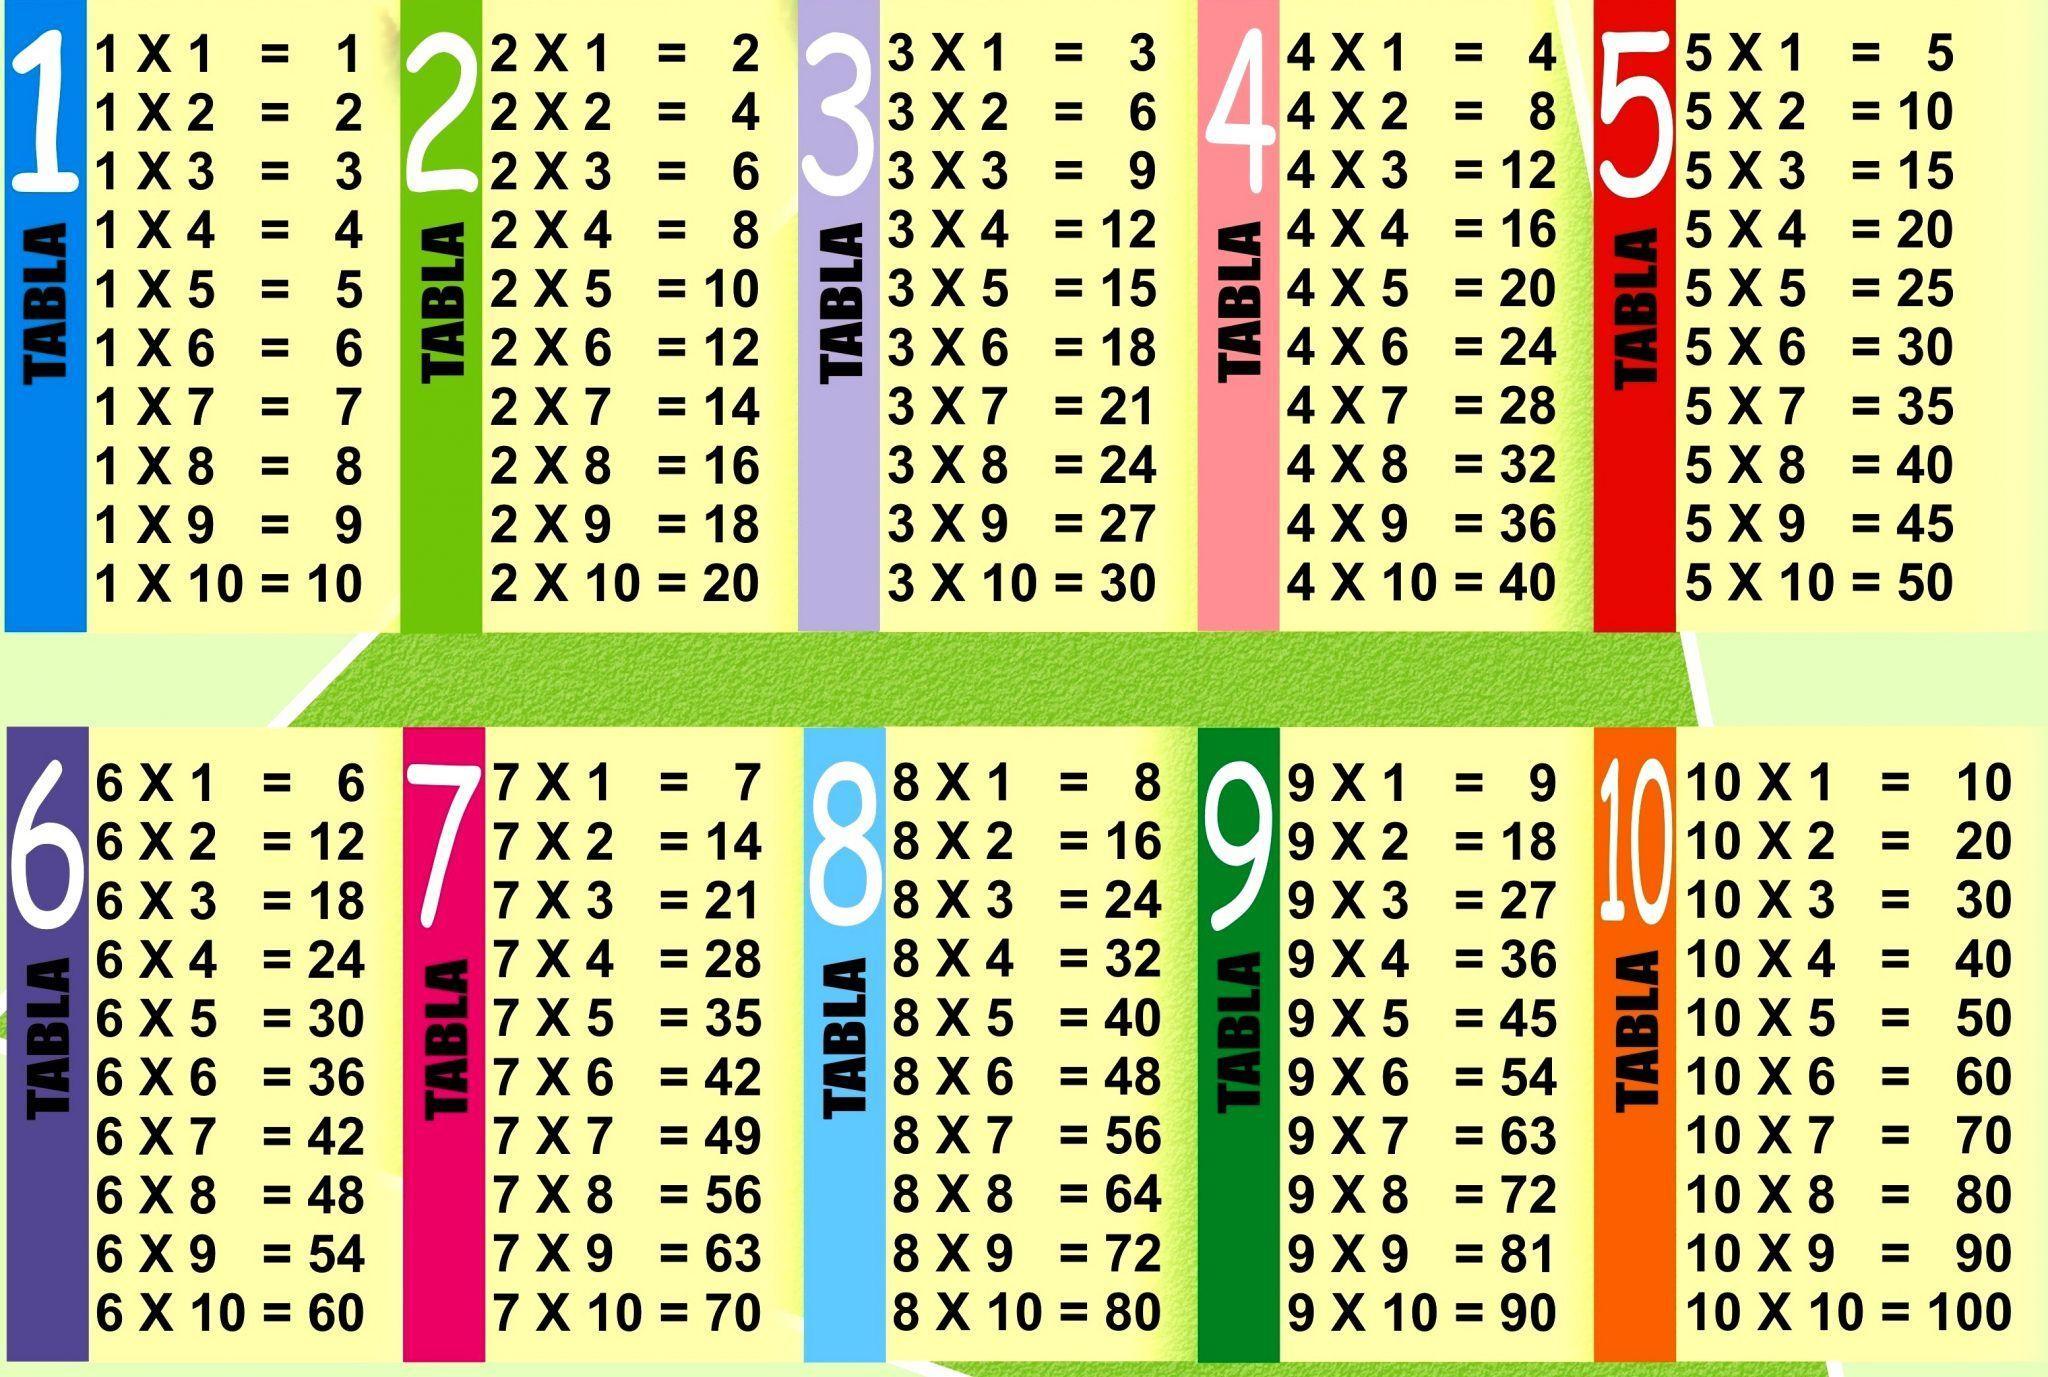 Math Worksheets Multiplication Tables 1-12